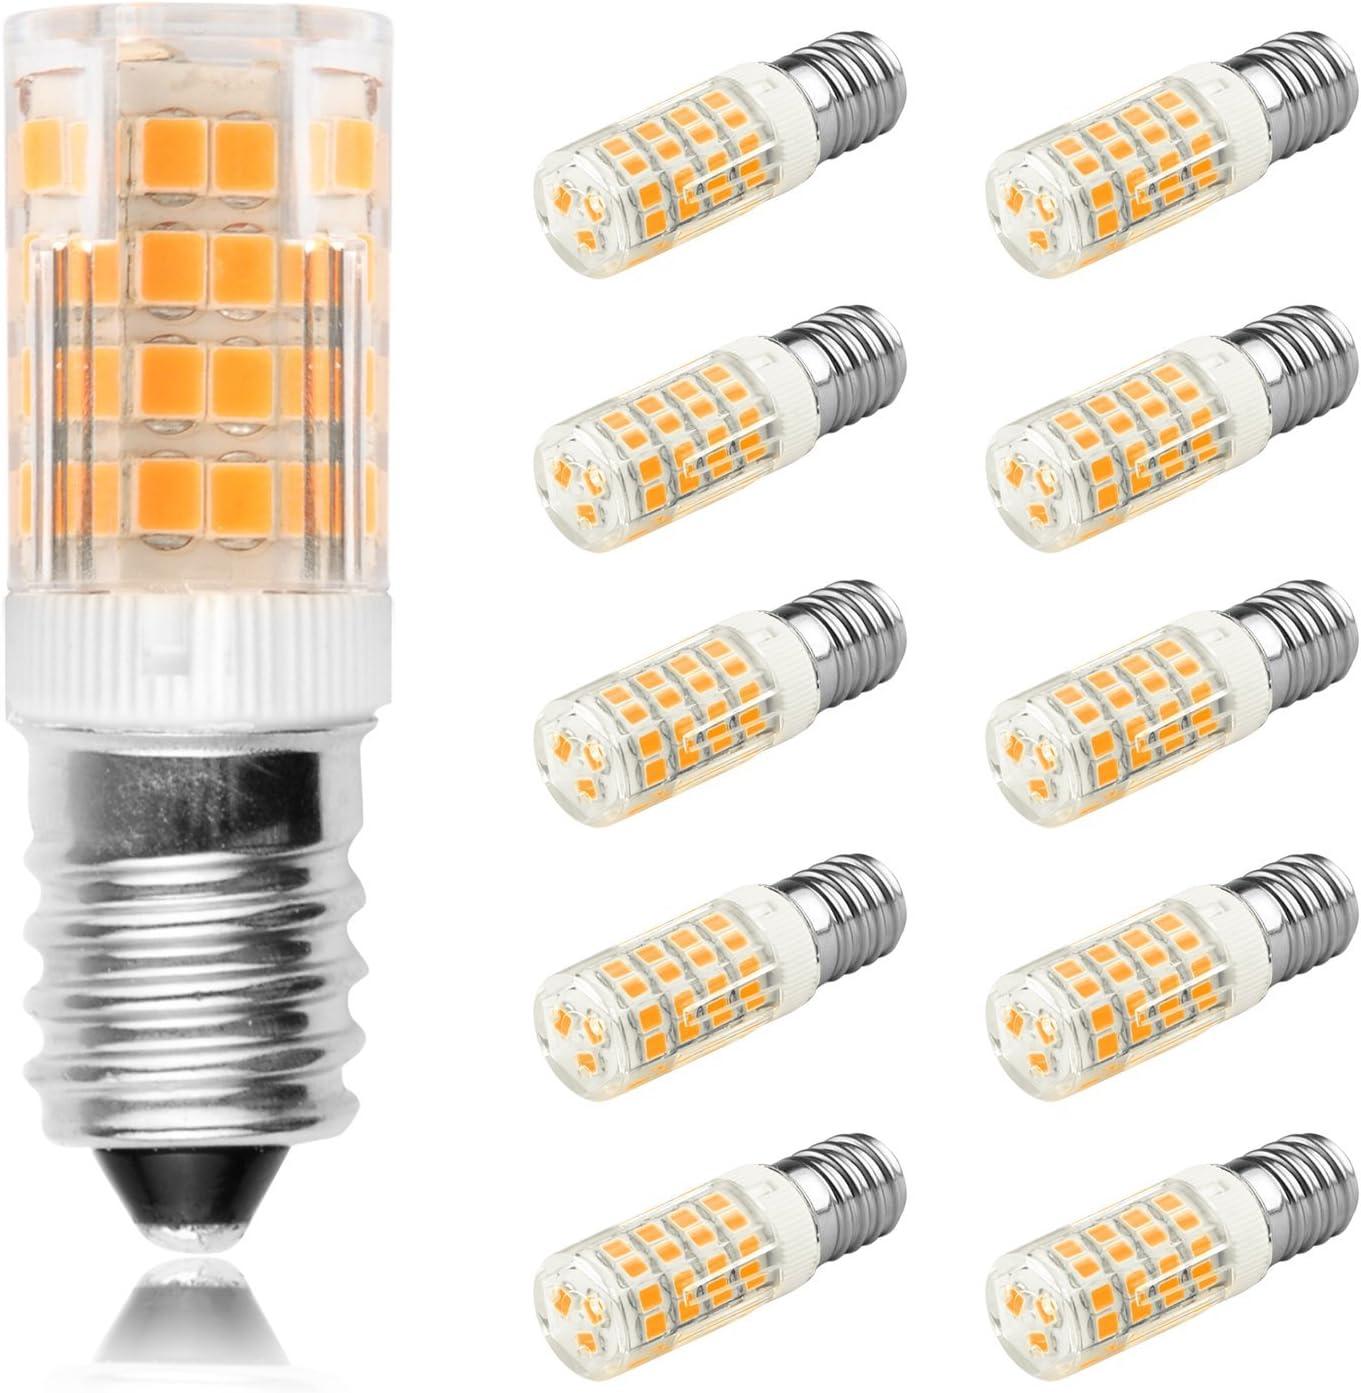 Ascher® 10er Pack E14 5W 51x2835 SMD LED Lampe (vgl. 30W Halogen) 350 Lumen E14 LED warmweiß AC 220V 240V LED Leuchtmittel 360°